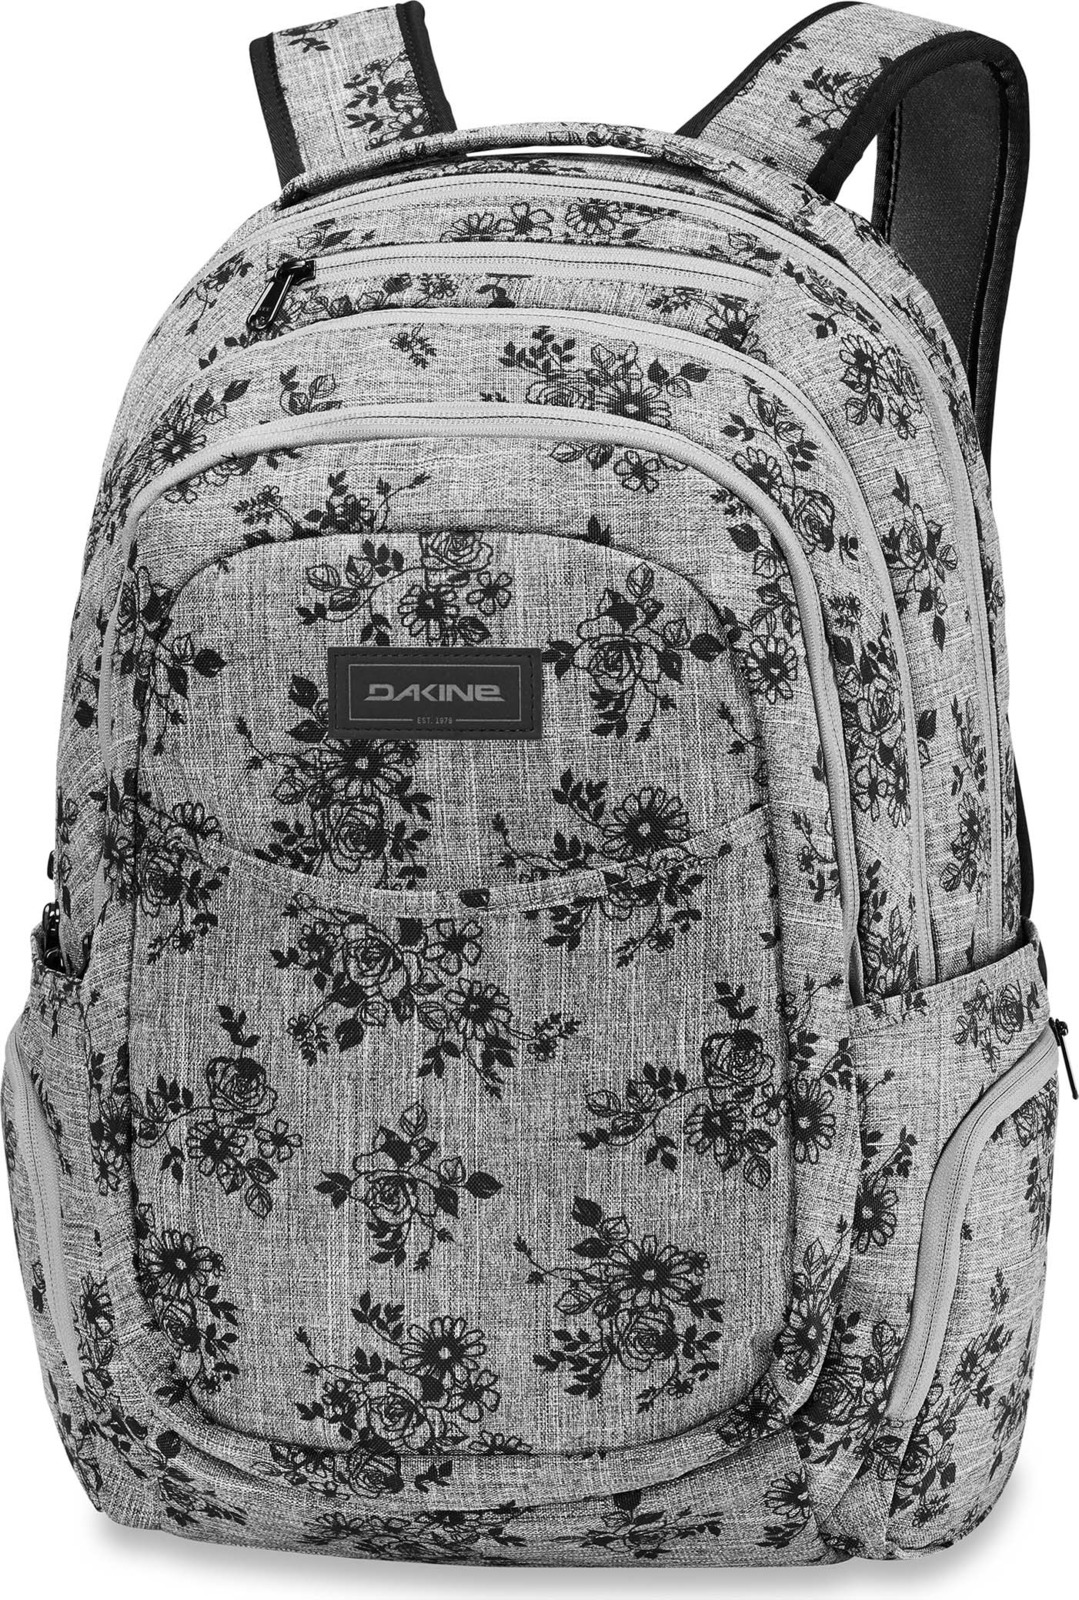 Рюкзак женский Dakine Prom SR, цвет: серый, 27 л рюкзак школьный женский dakine prom emerald